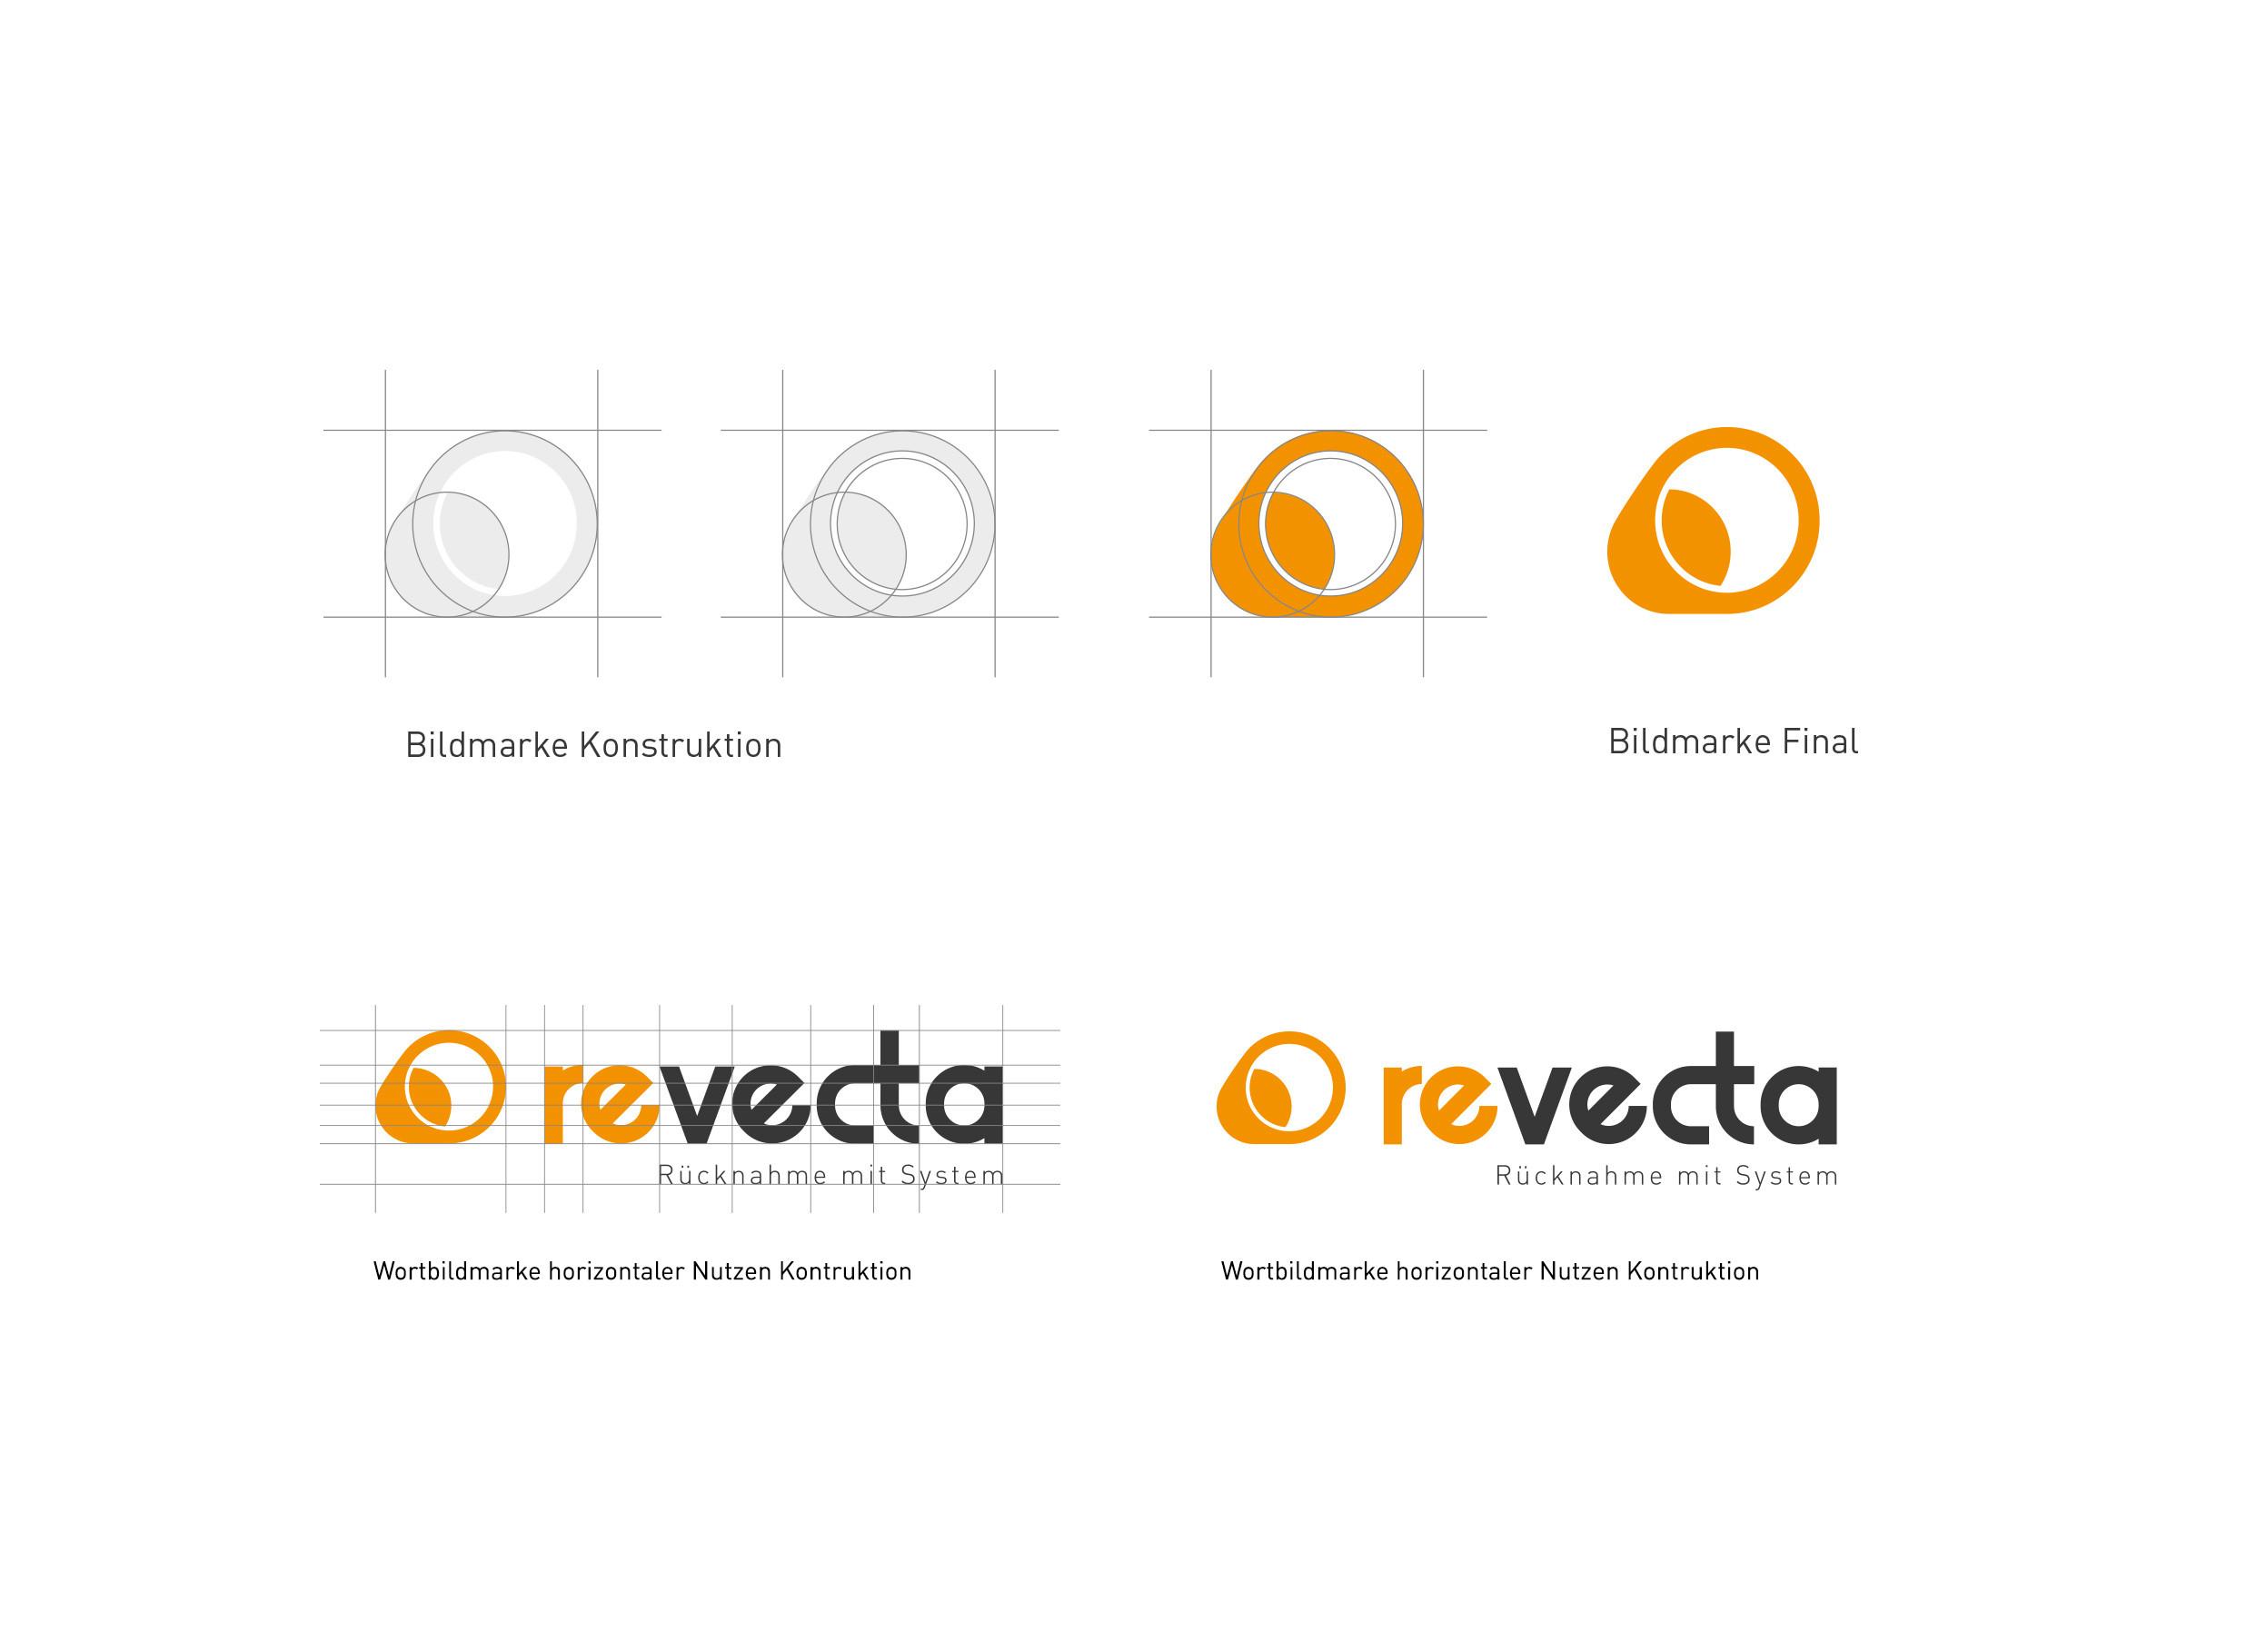 revecta_mockup_8